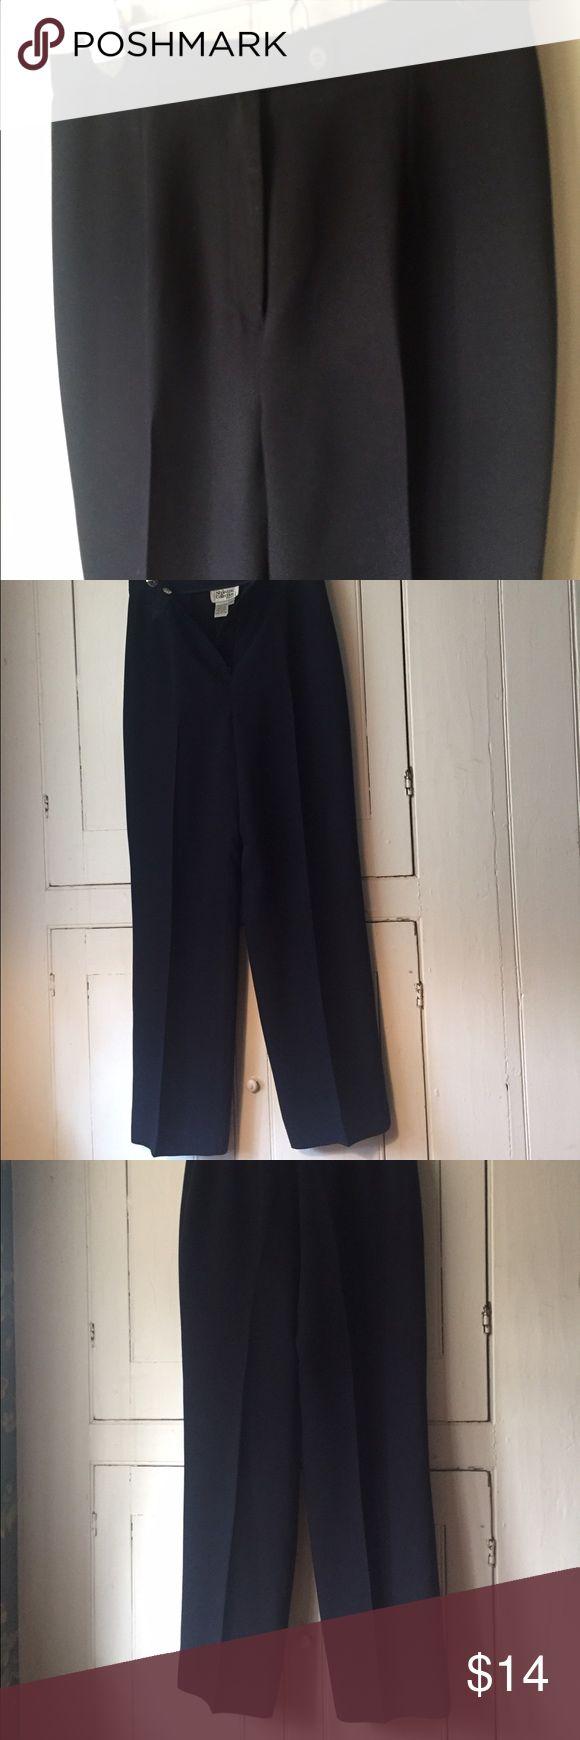 Navy Blue Dress Pants Navy Dress Pants; Petite Size 4 Style & Co Pants Straight Leg